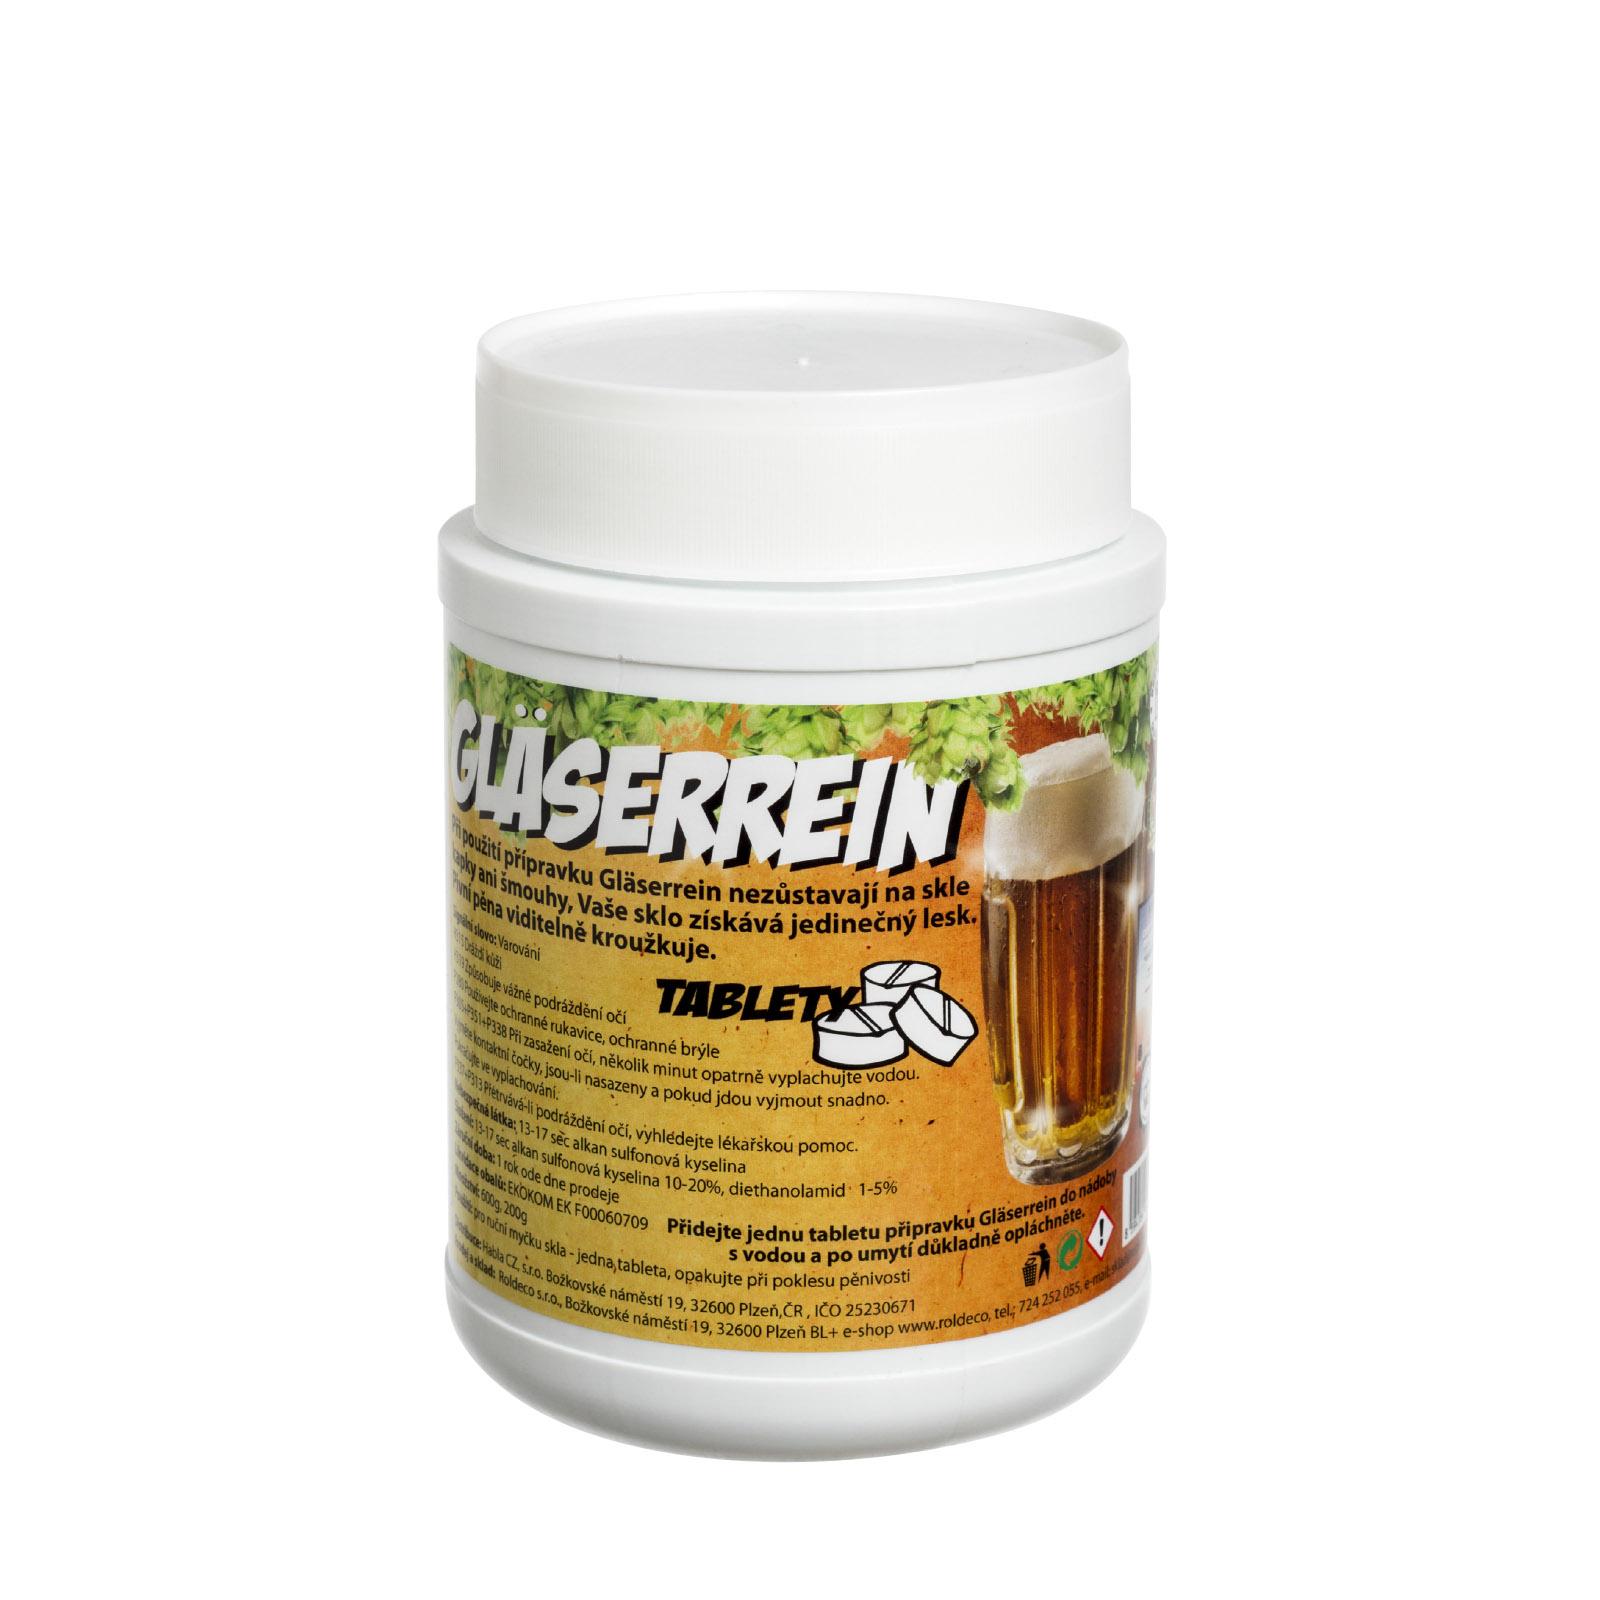 Gläserrein tablety - balení 600 g